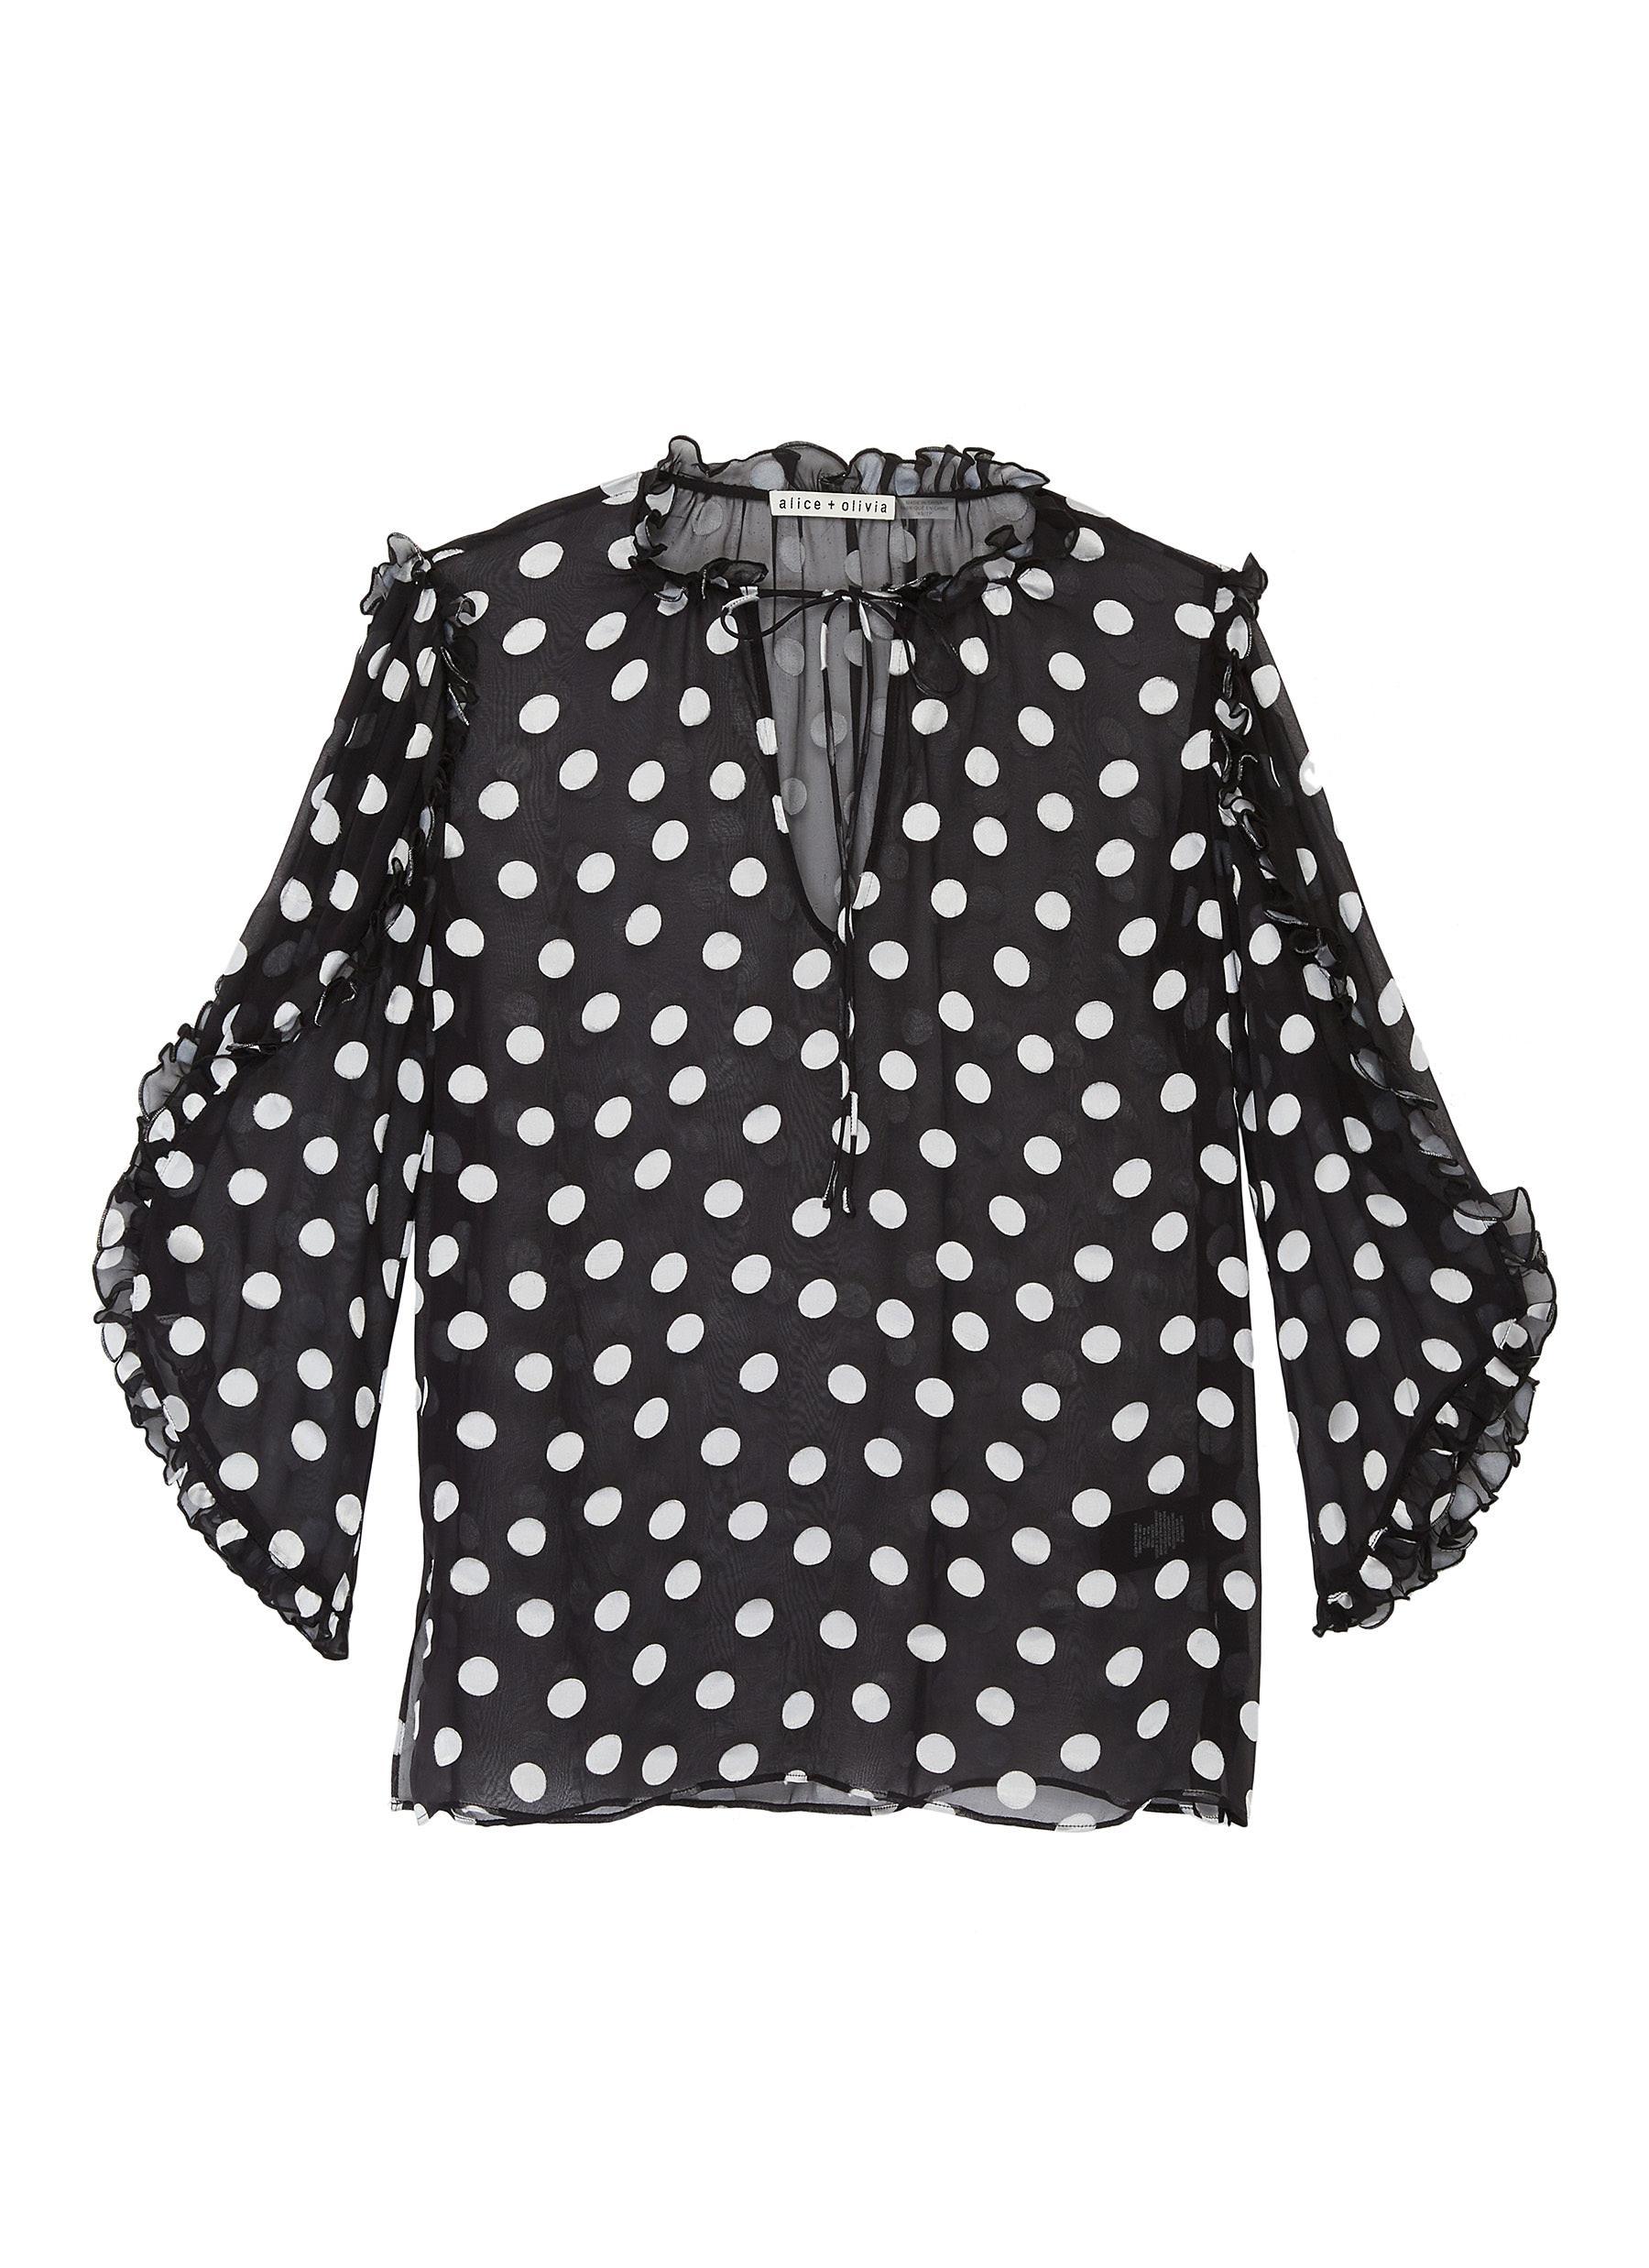 Julius sheer ruffle sleeve polka dot print tunic top by Alice + Olivia